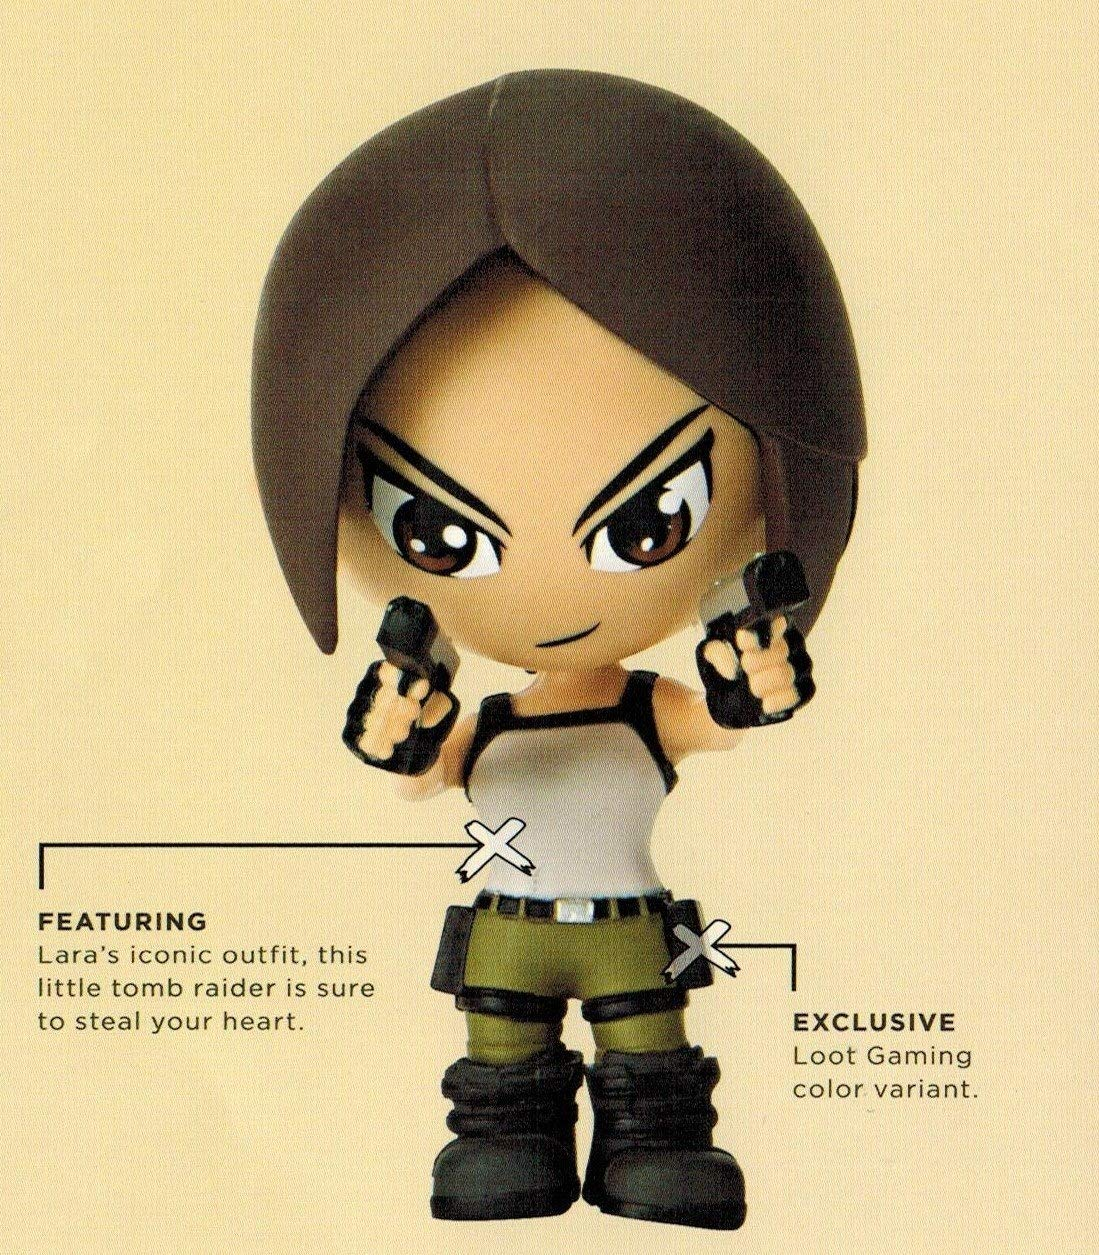 Tomb Raider Lara Croft Figure Loot Crate Gaming July 2016 Exclusive